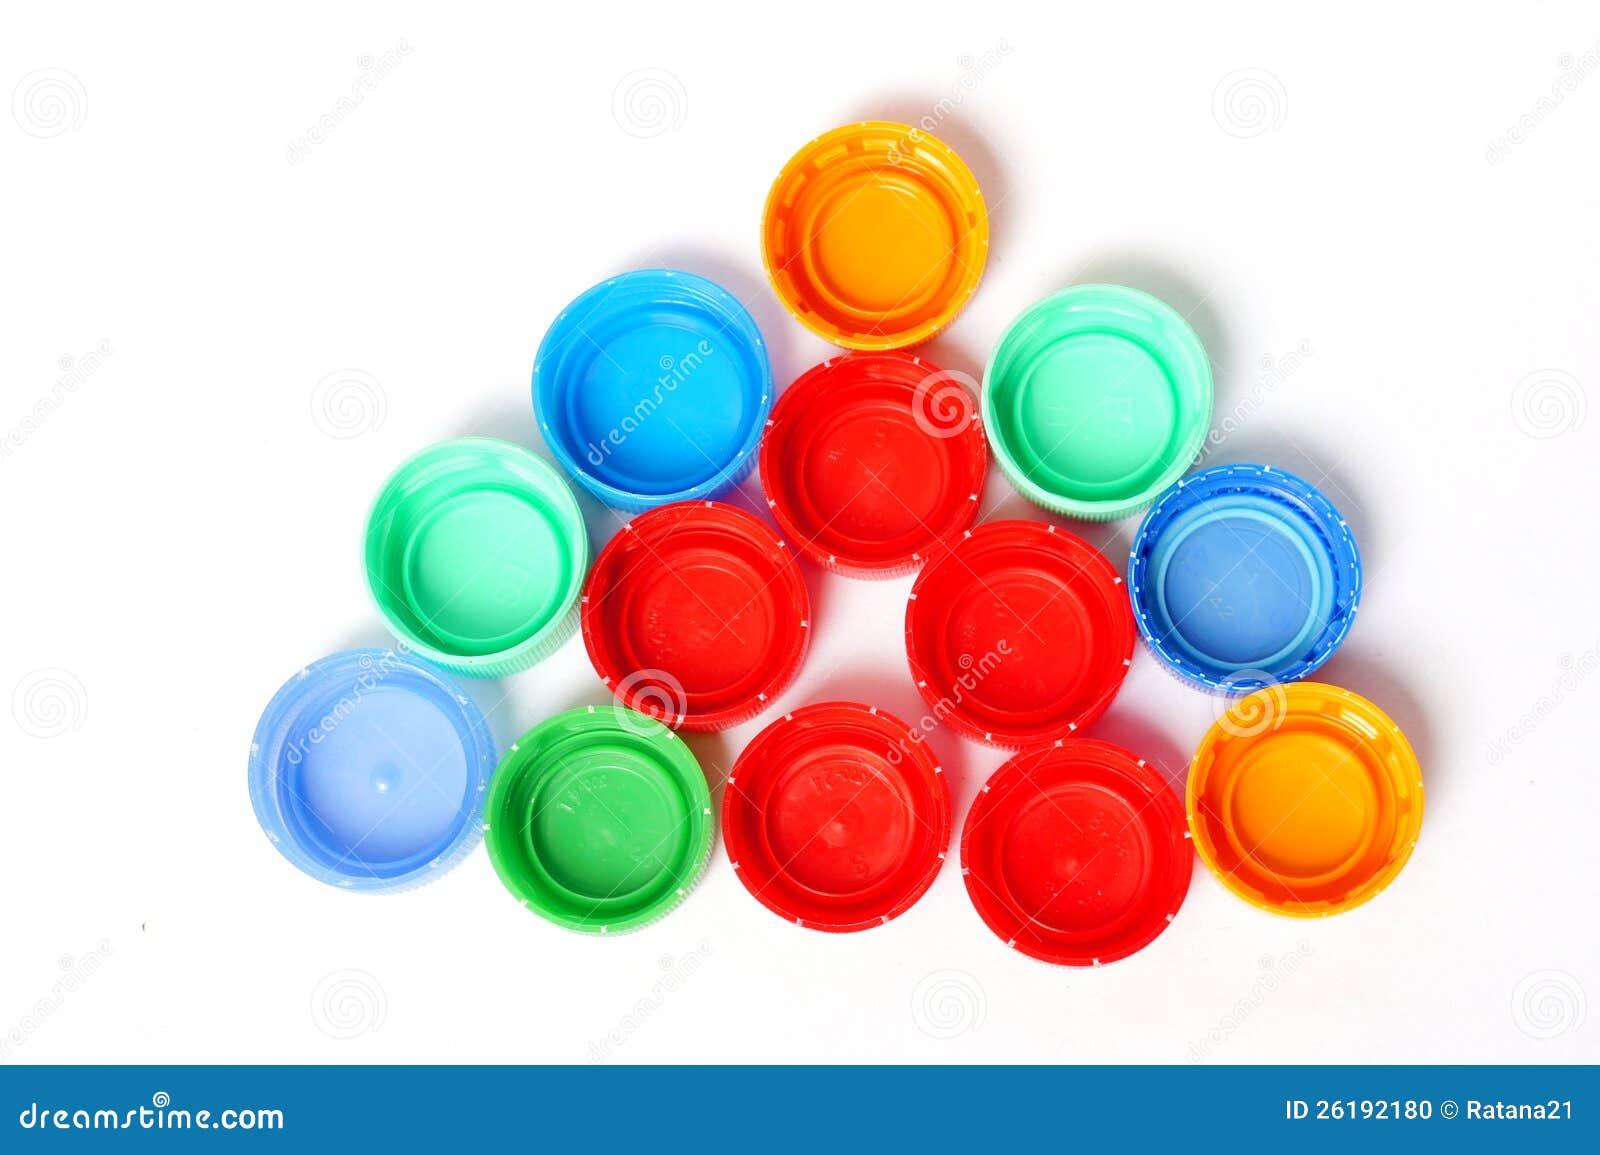 Tapas Plásticas Coloridas De La Botella Foto de archivo - Imagen de ... 7cd8bce60e06